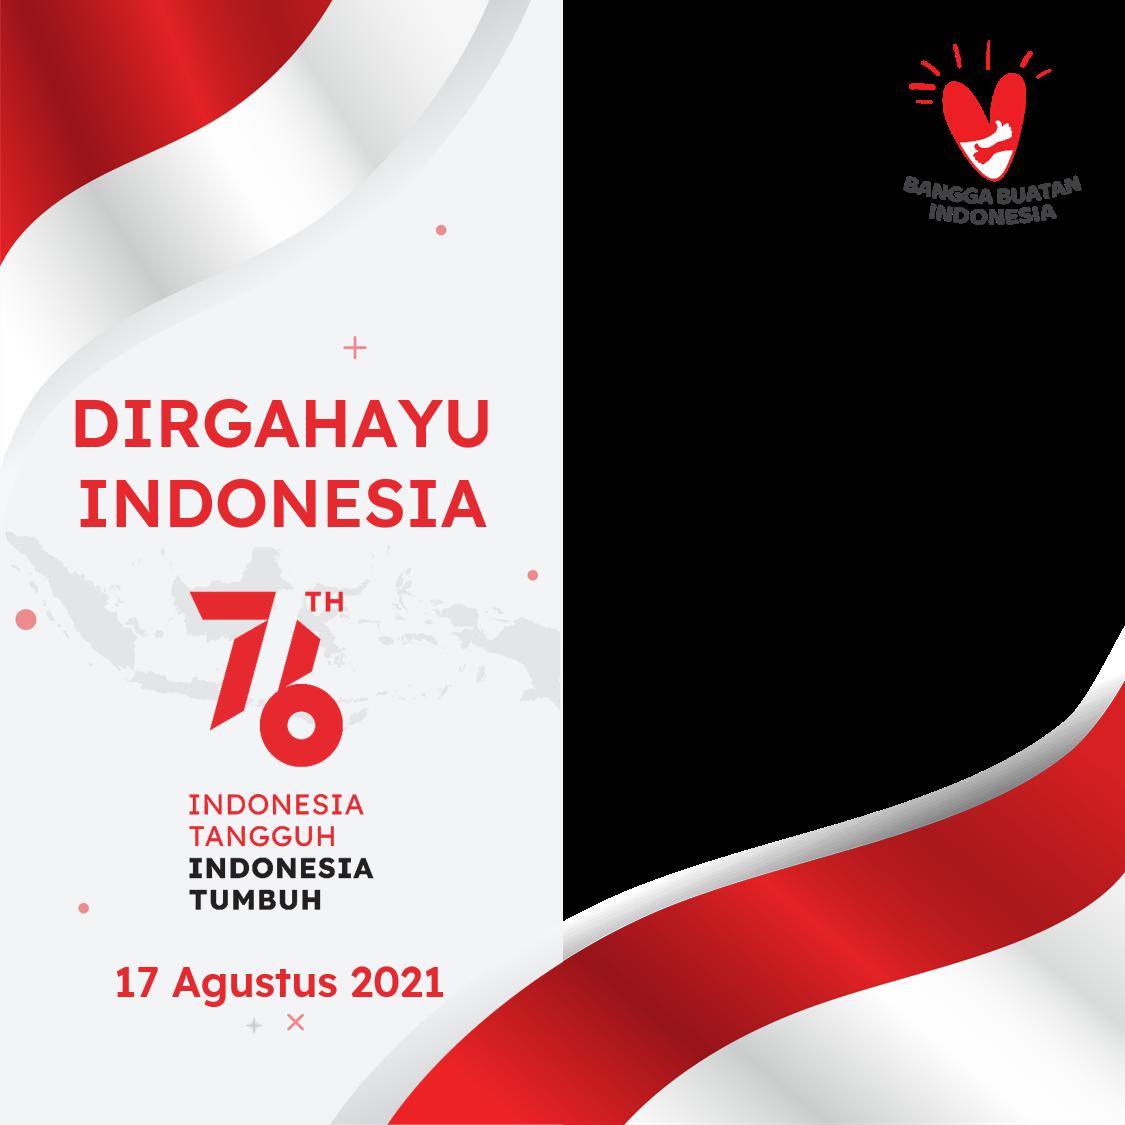 Link Desain Bingkai Foto Twibbon Dirgahayu HUT RI ke-76 Tahun 2021 - Twibbonize